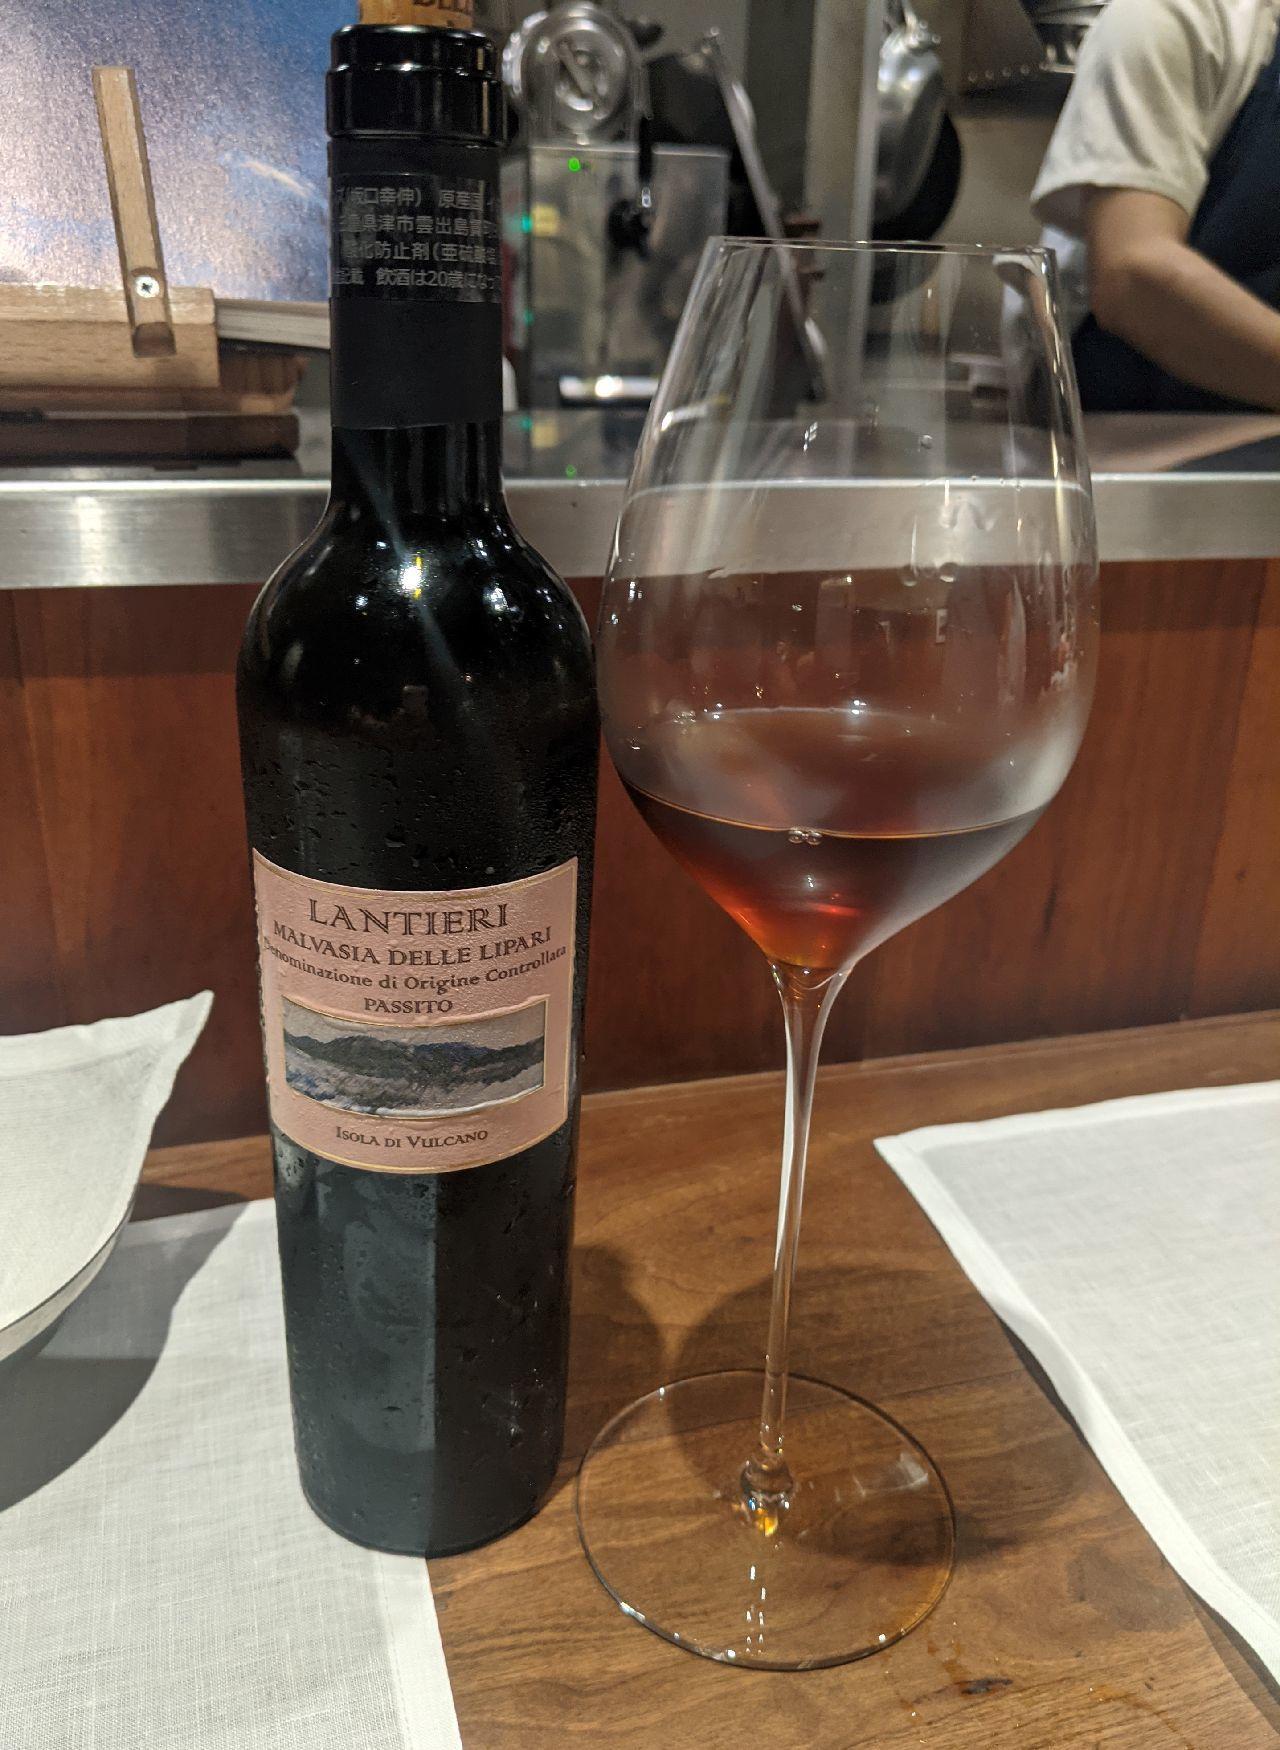 PXL_20210806_130232638デザートワイン、ランティエリ マルヴァジア・デッレ・リーパリ パッシート